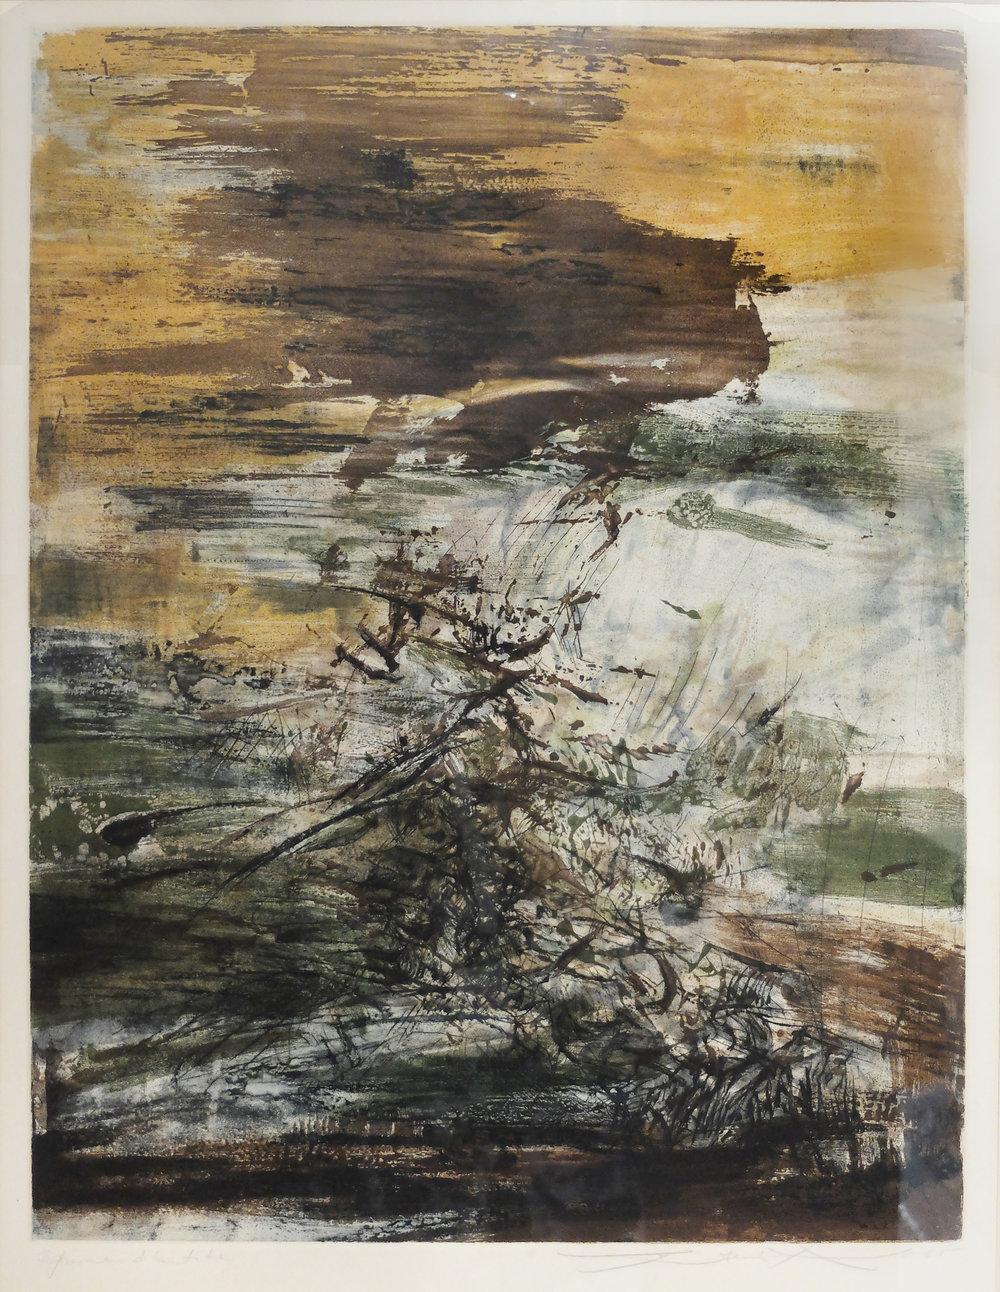 Zao Wou-Ki (Chinese, 1921 - 2013)